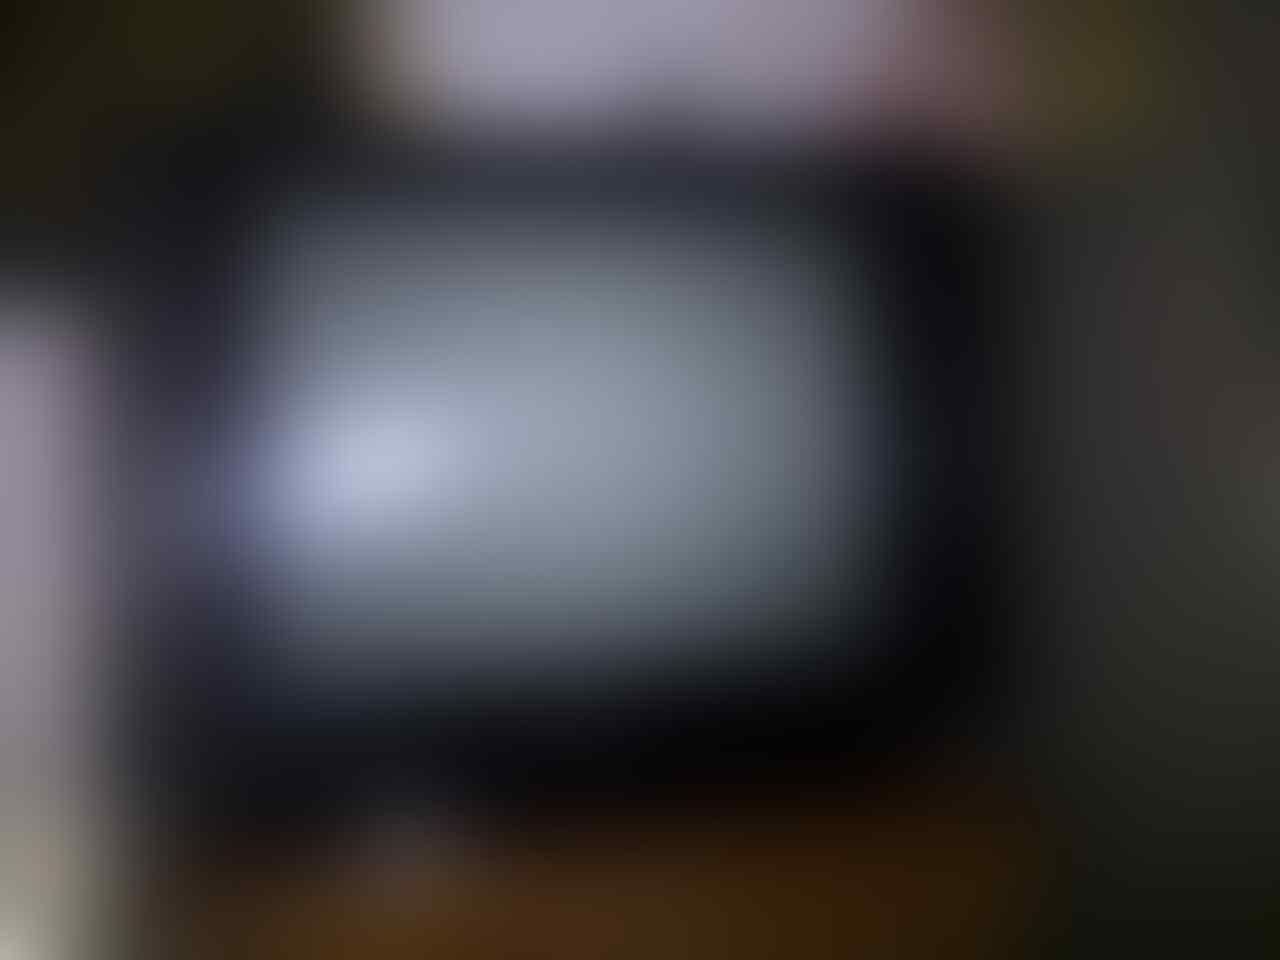 TV LG FLAT 21 INCH